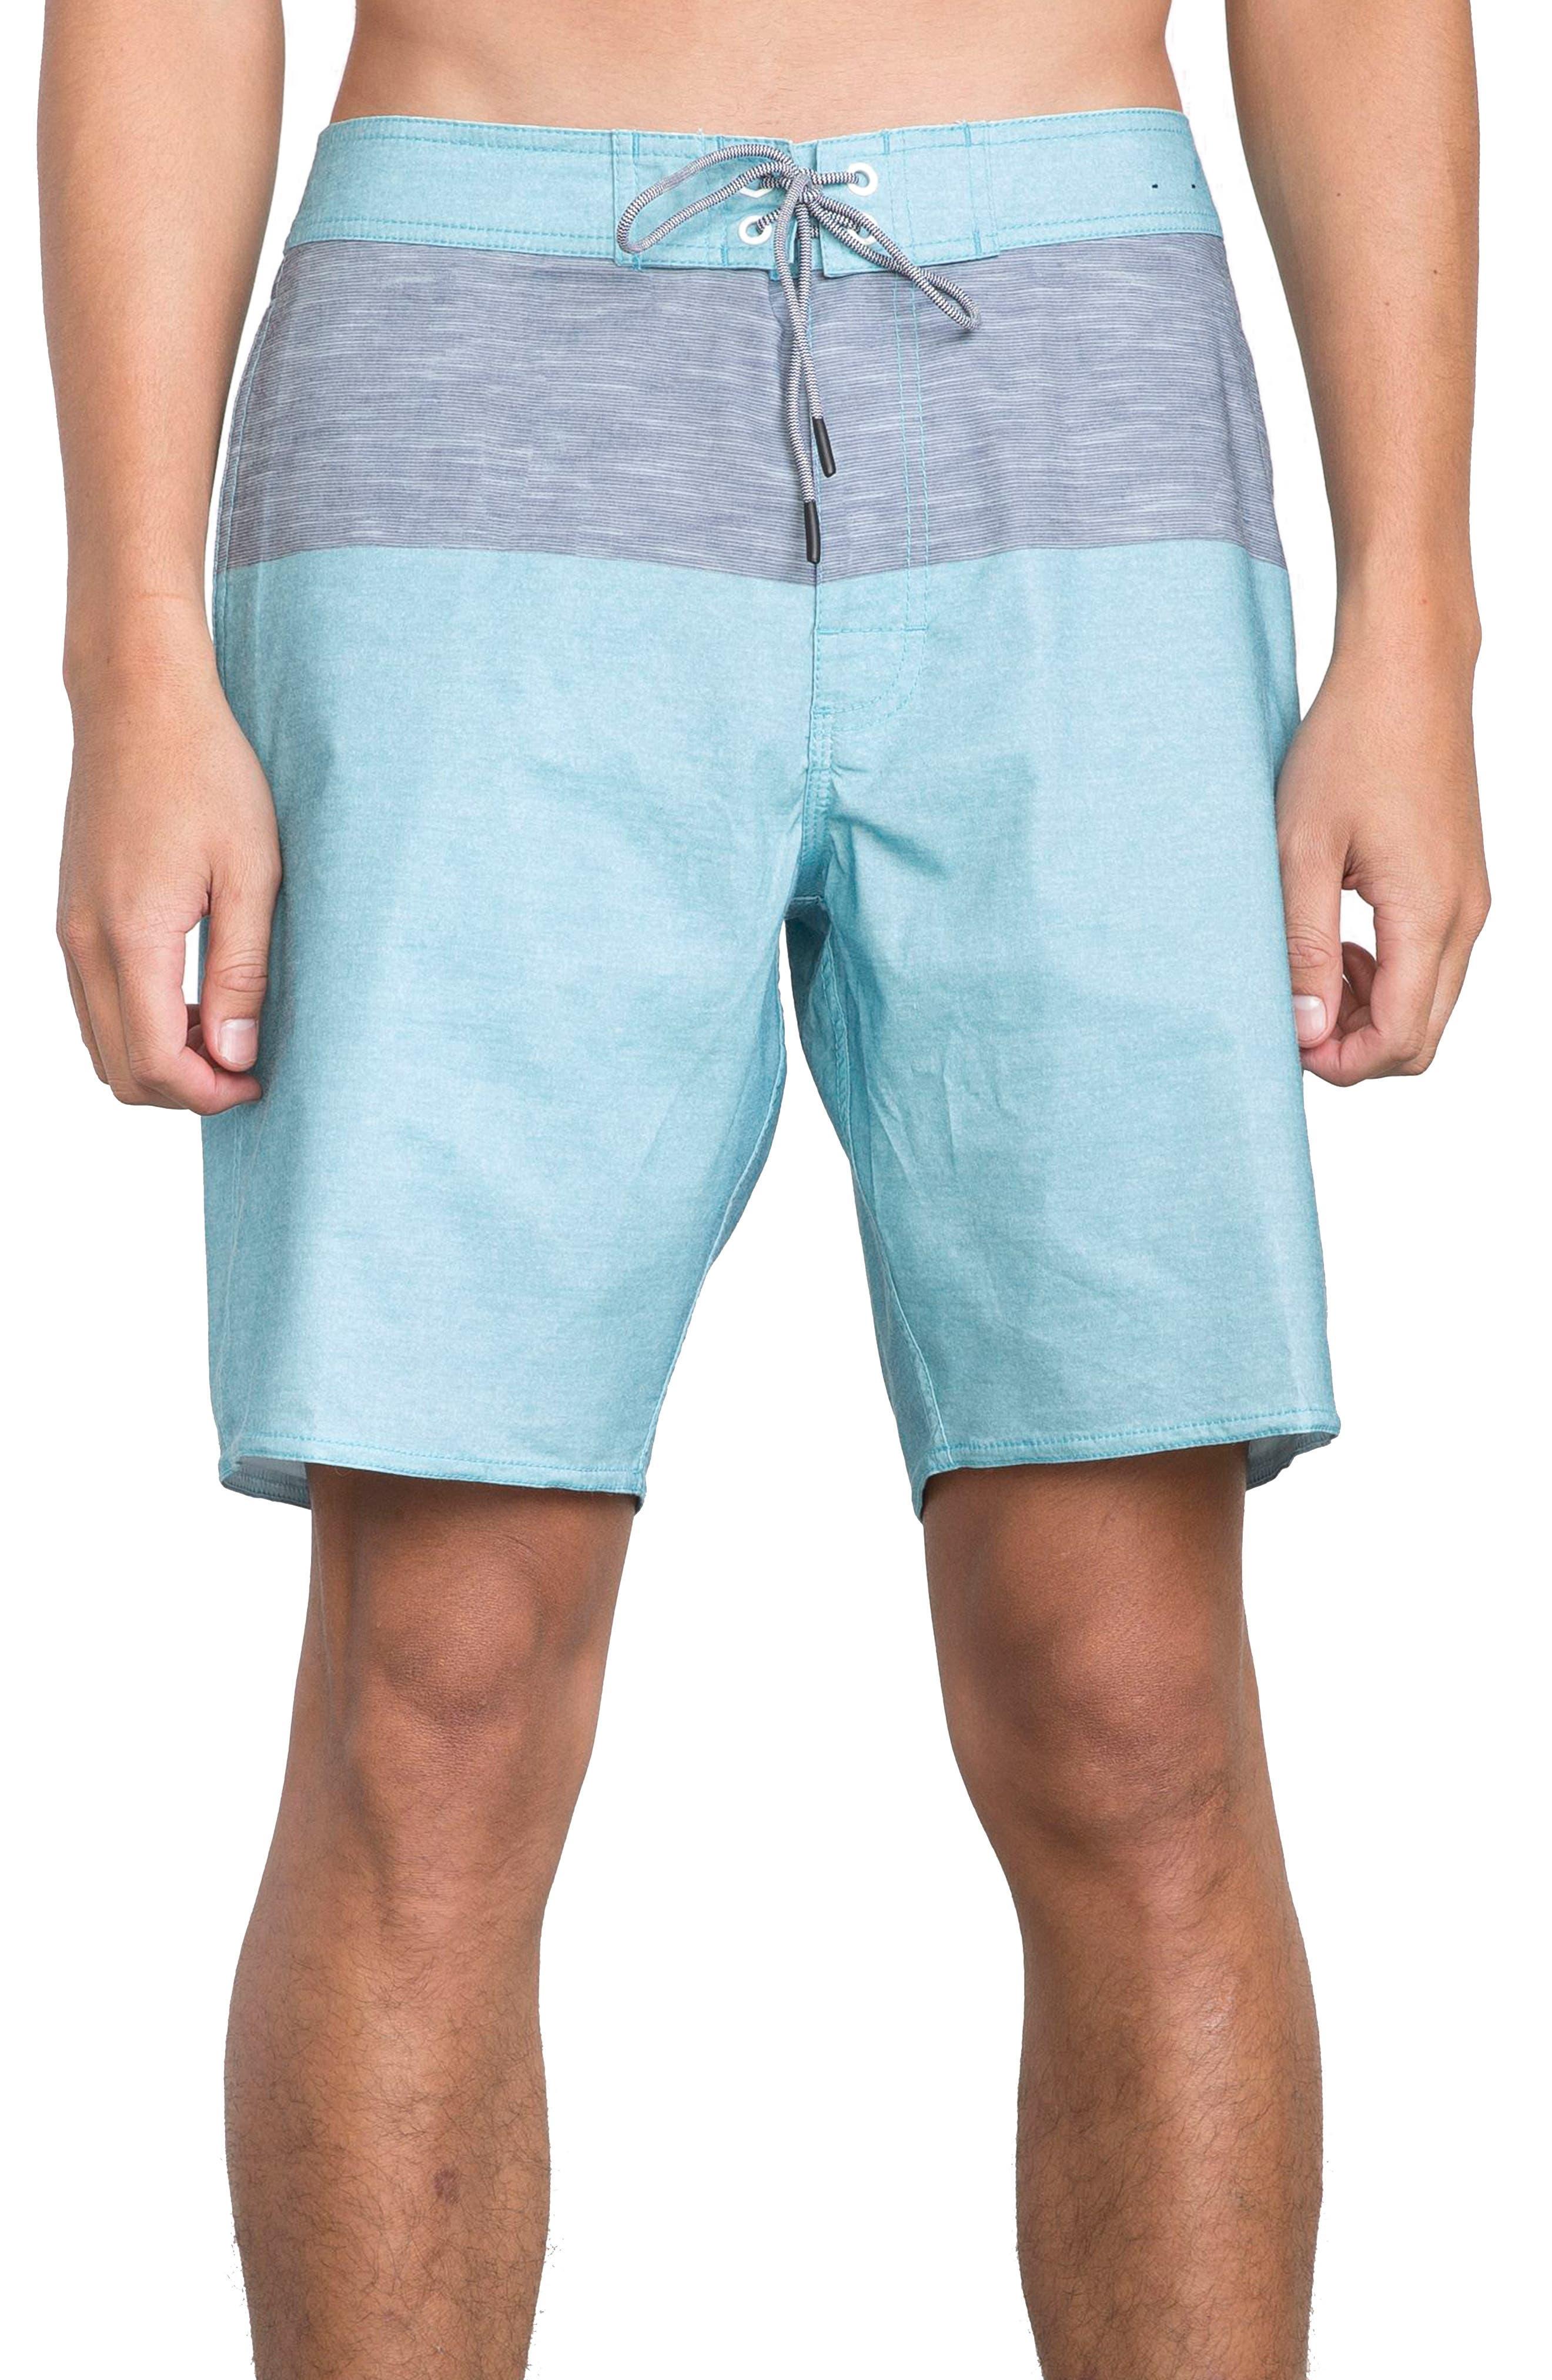 Gothard Board Shorts,                             Main thumbnail 1, color,                             MAUI BLUE